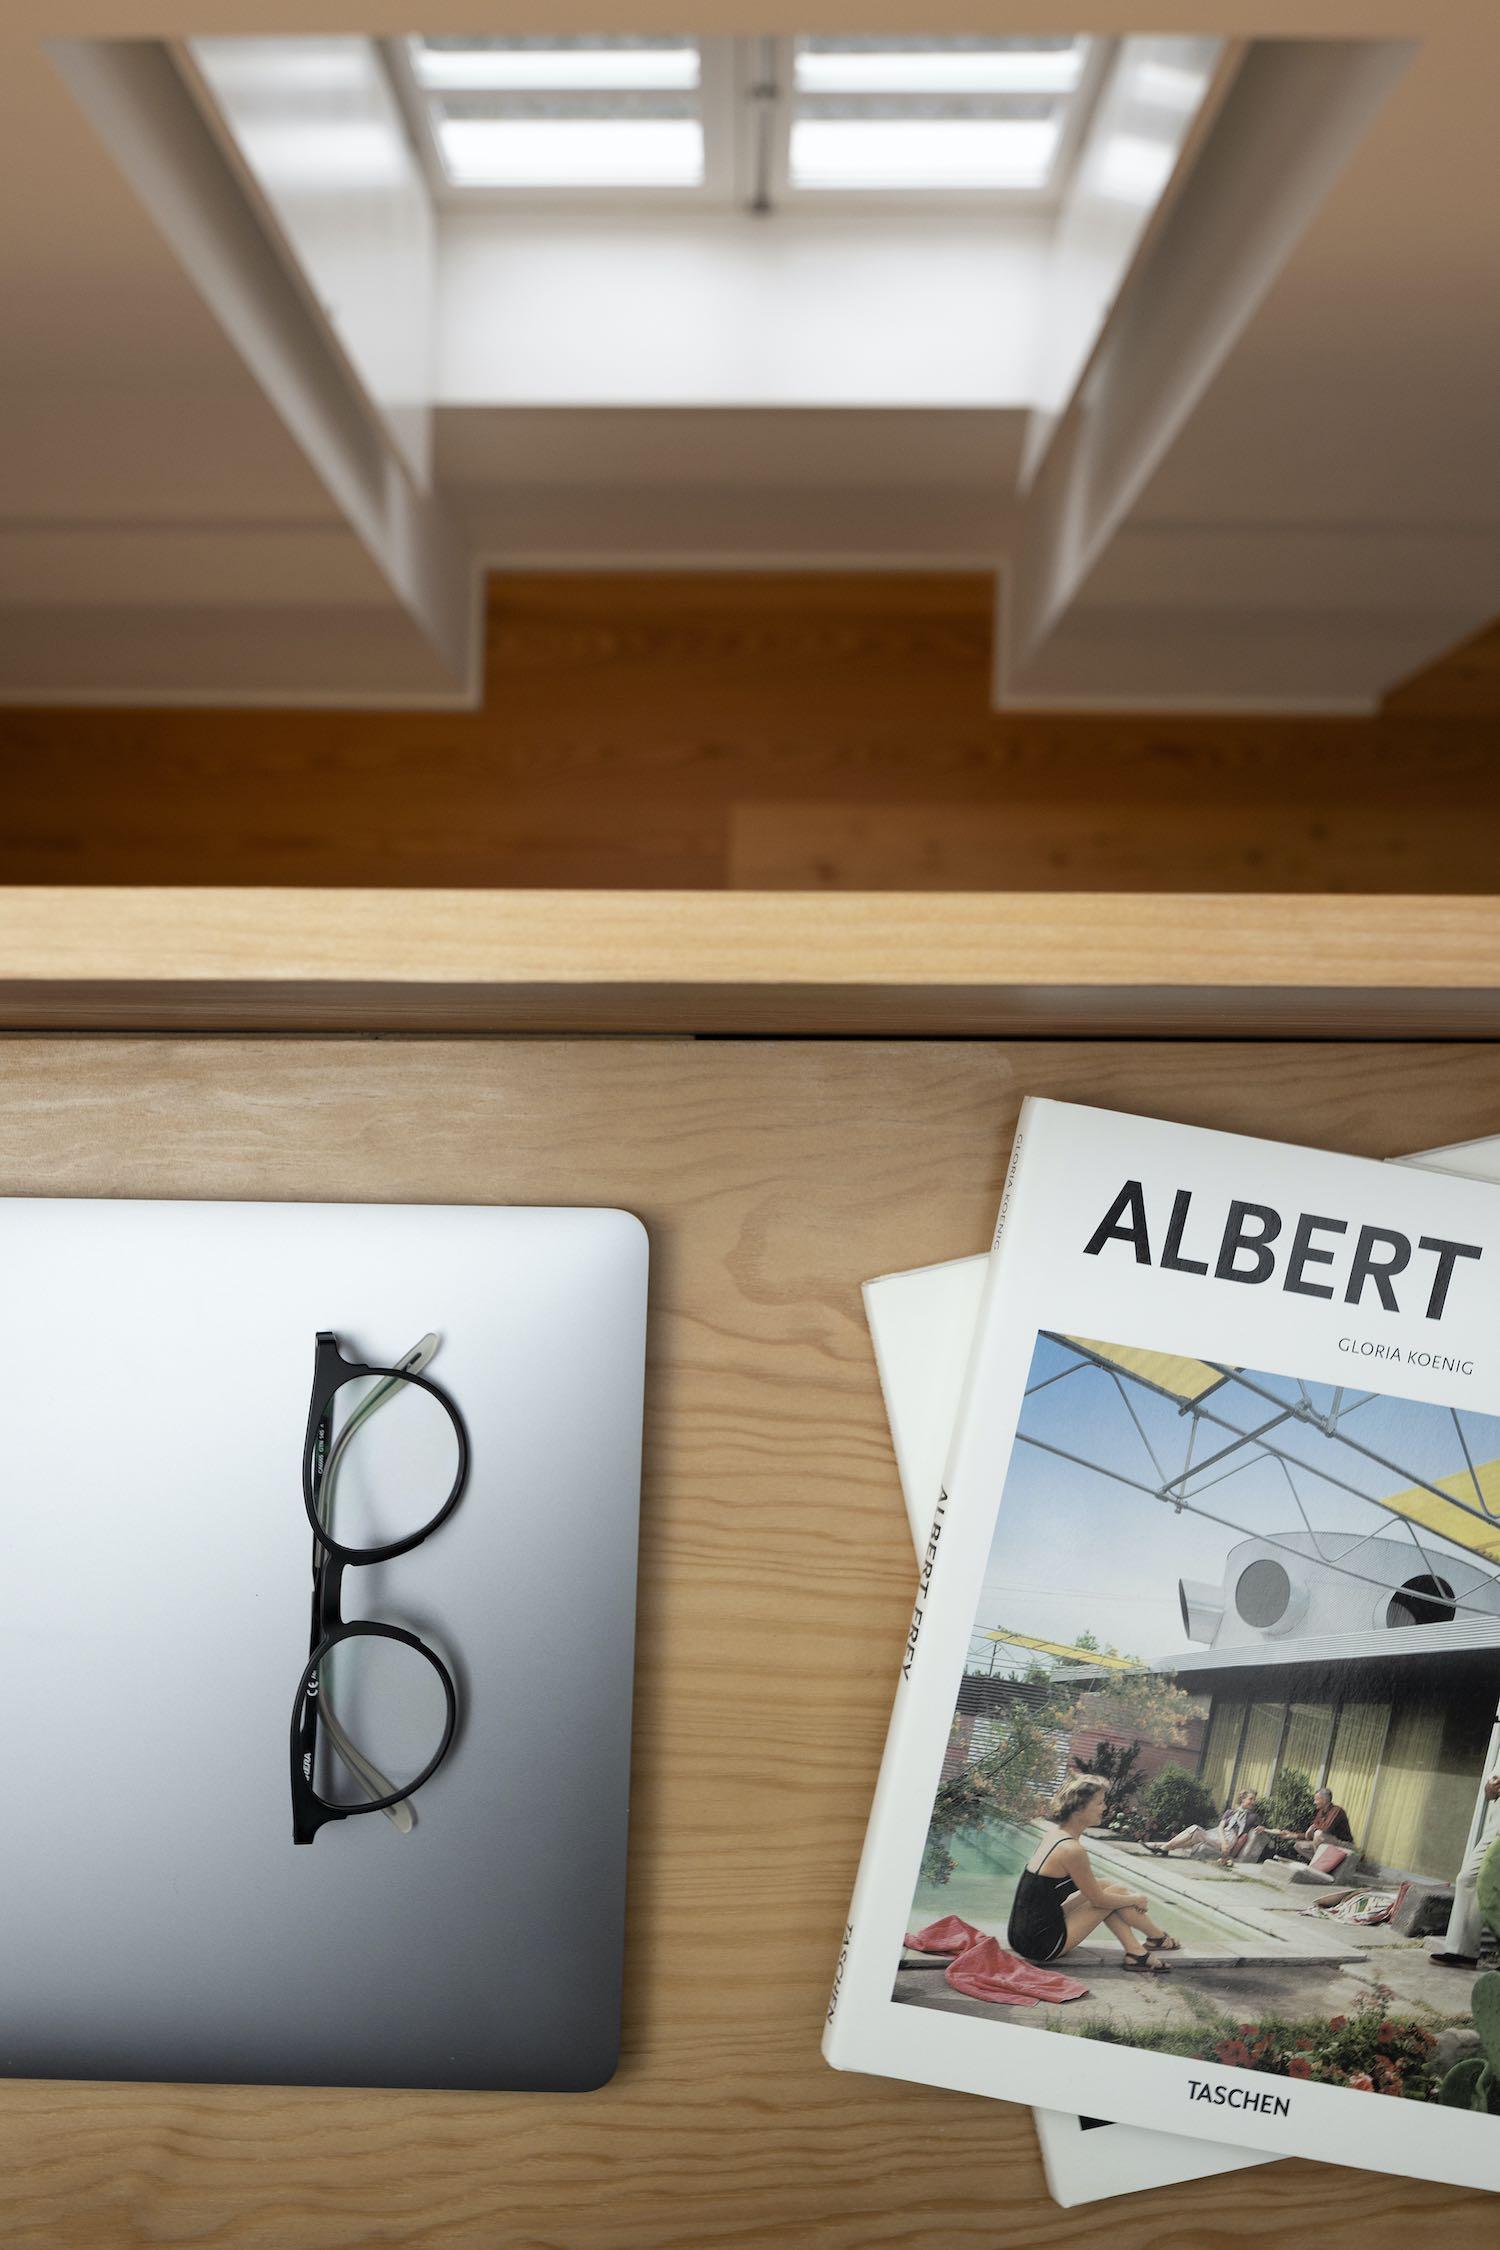 glass, MacBook and books